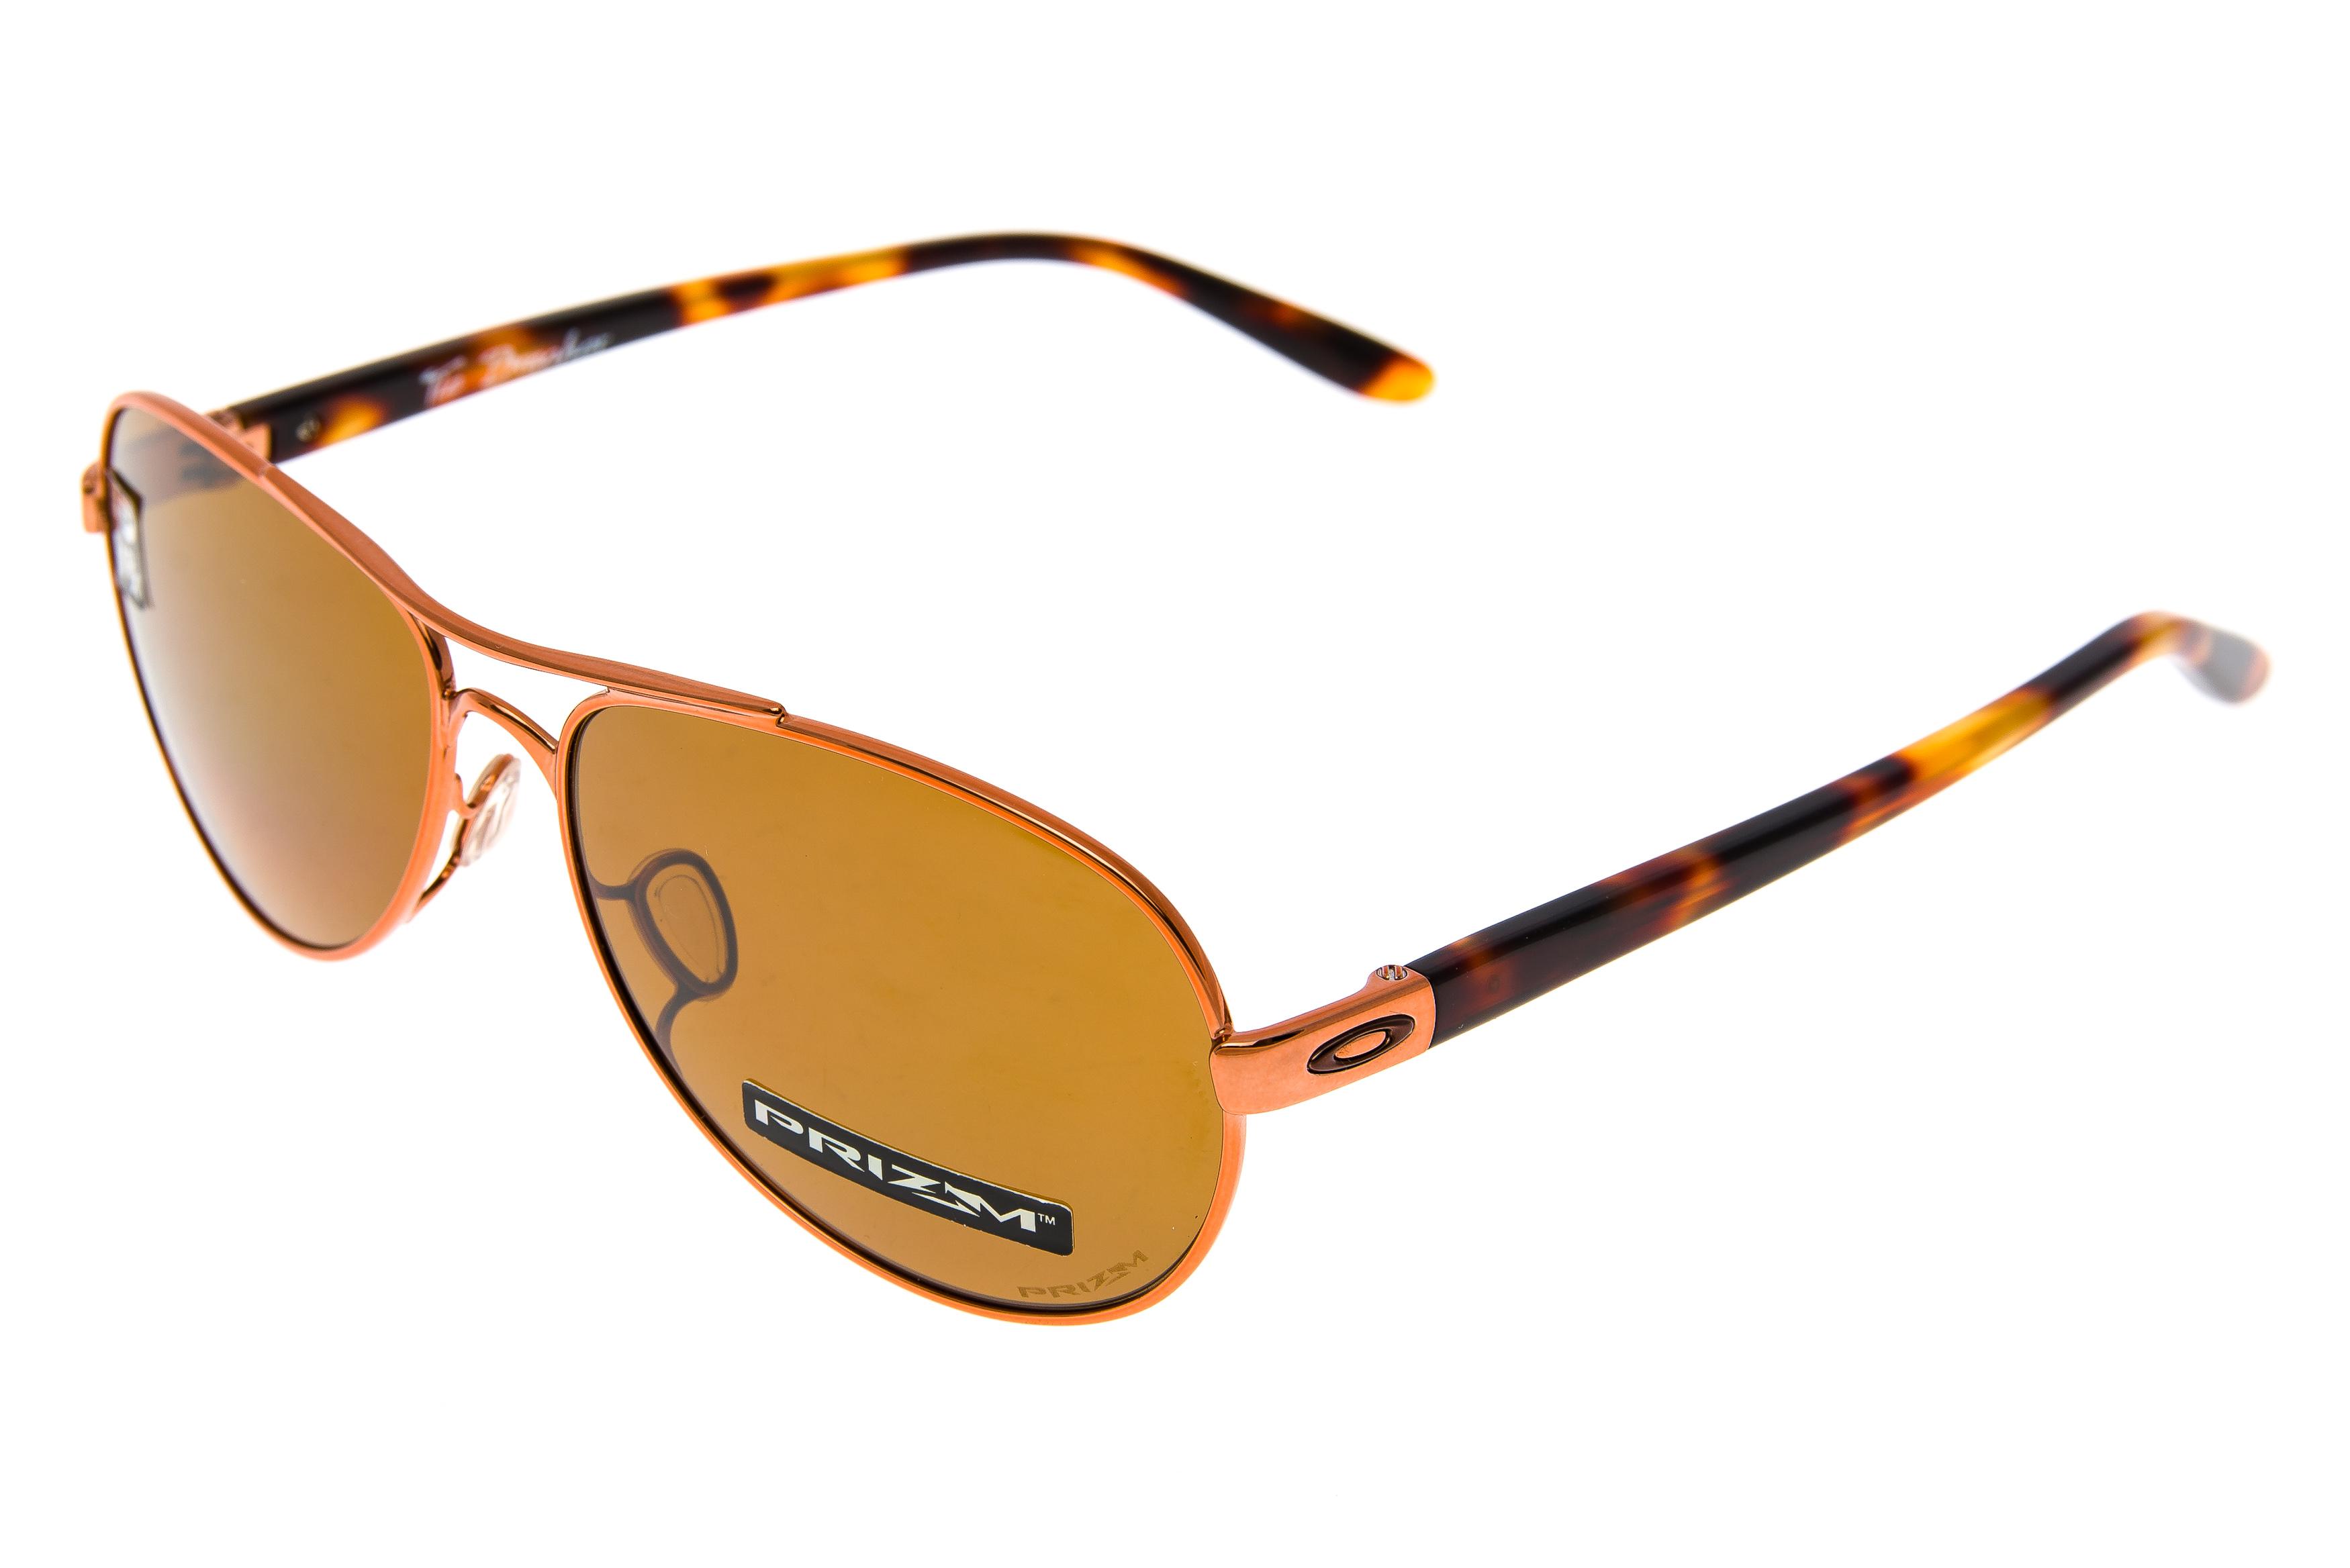 3b8da6d32cb Oakley Tie Breaker Sunglasses Rose Gold Frame Prizm Tungsten Polarized Lens